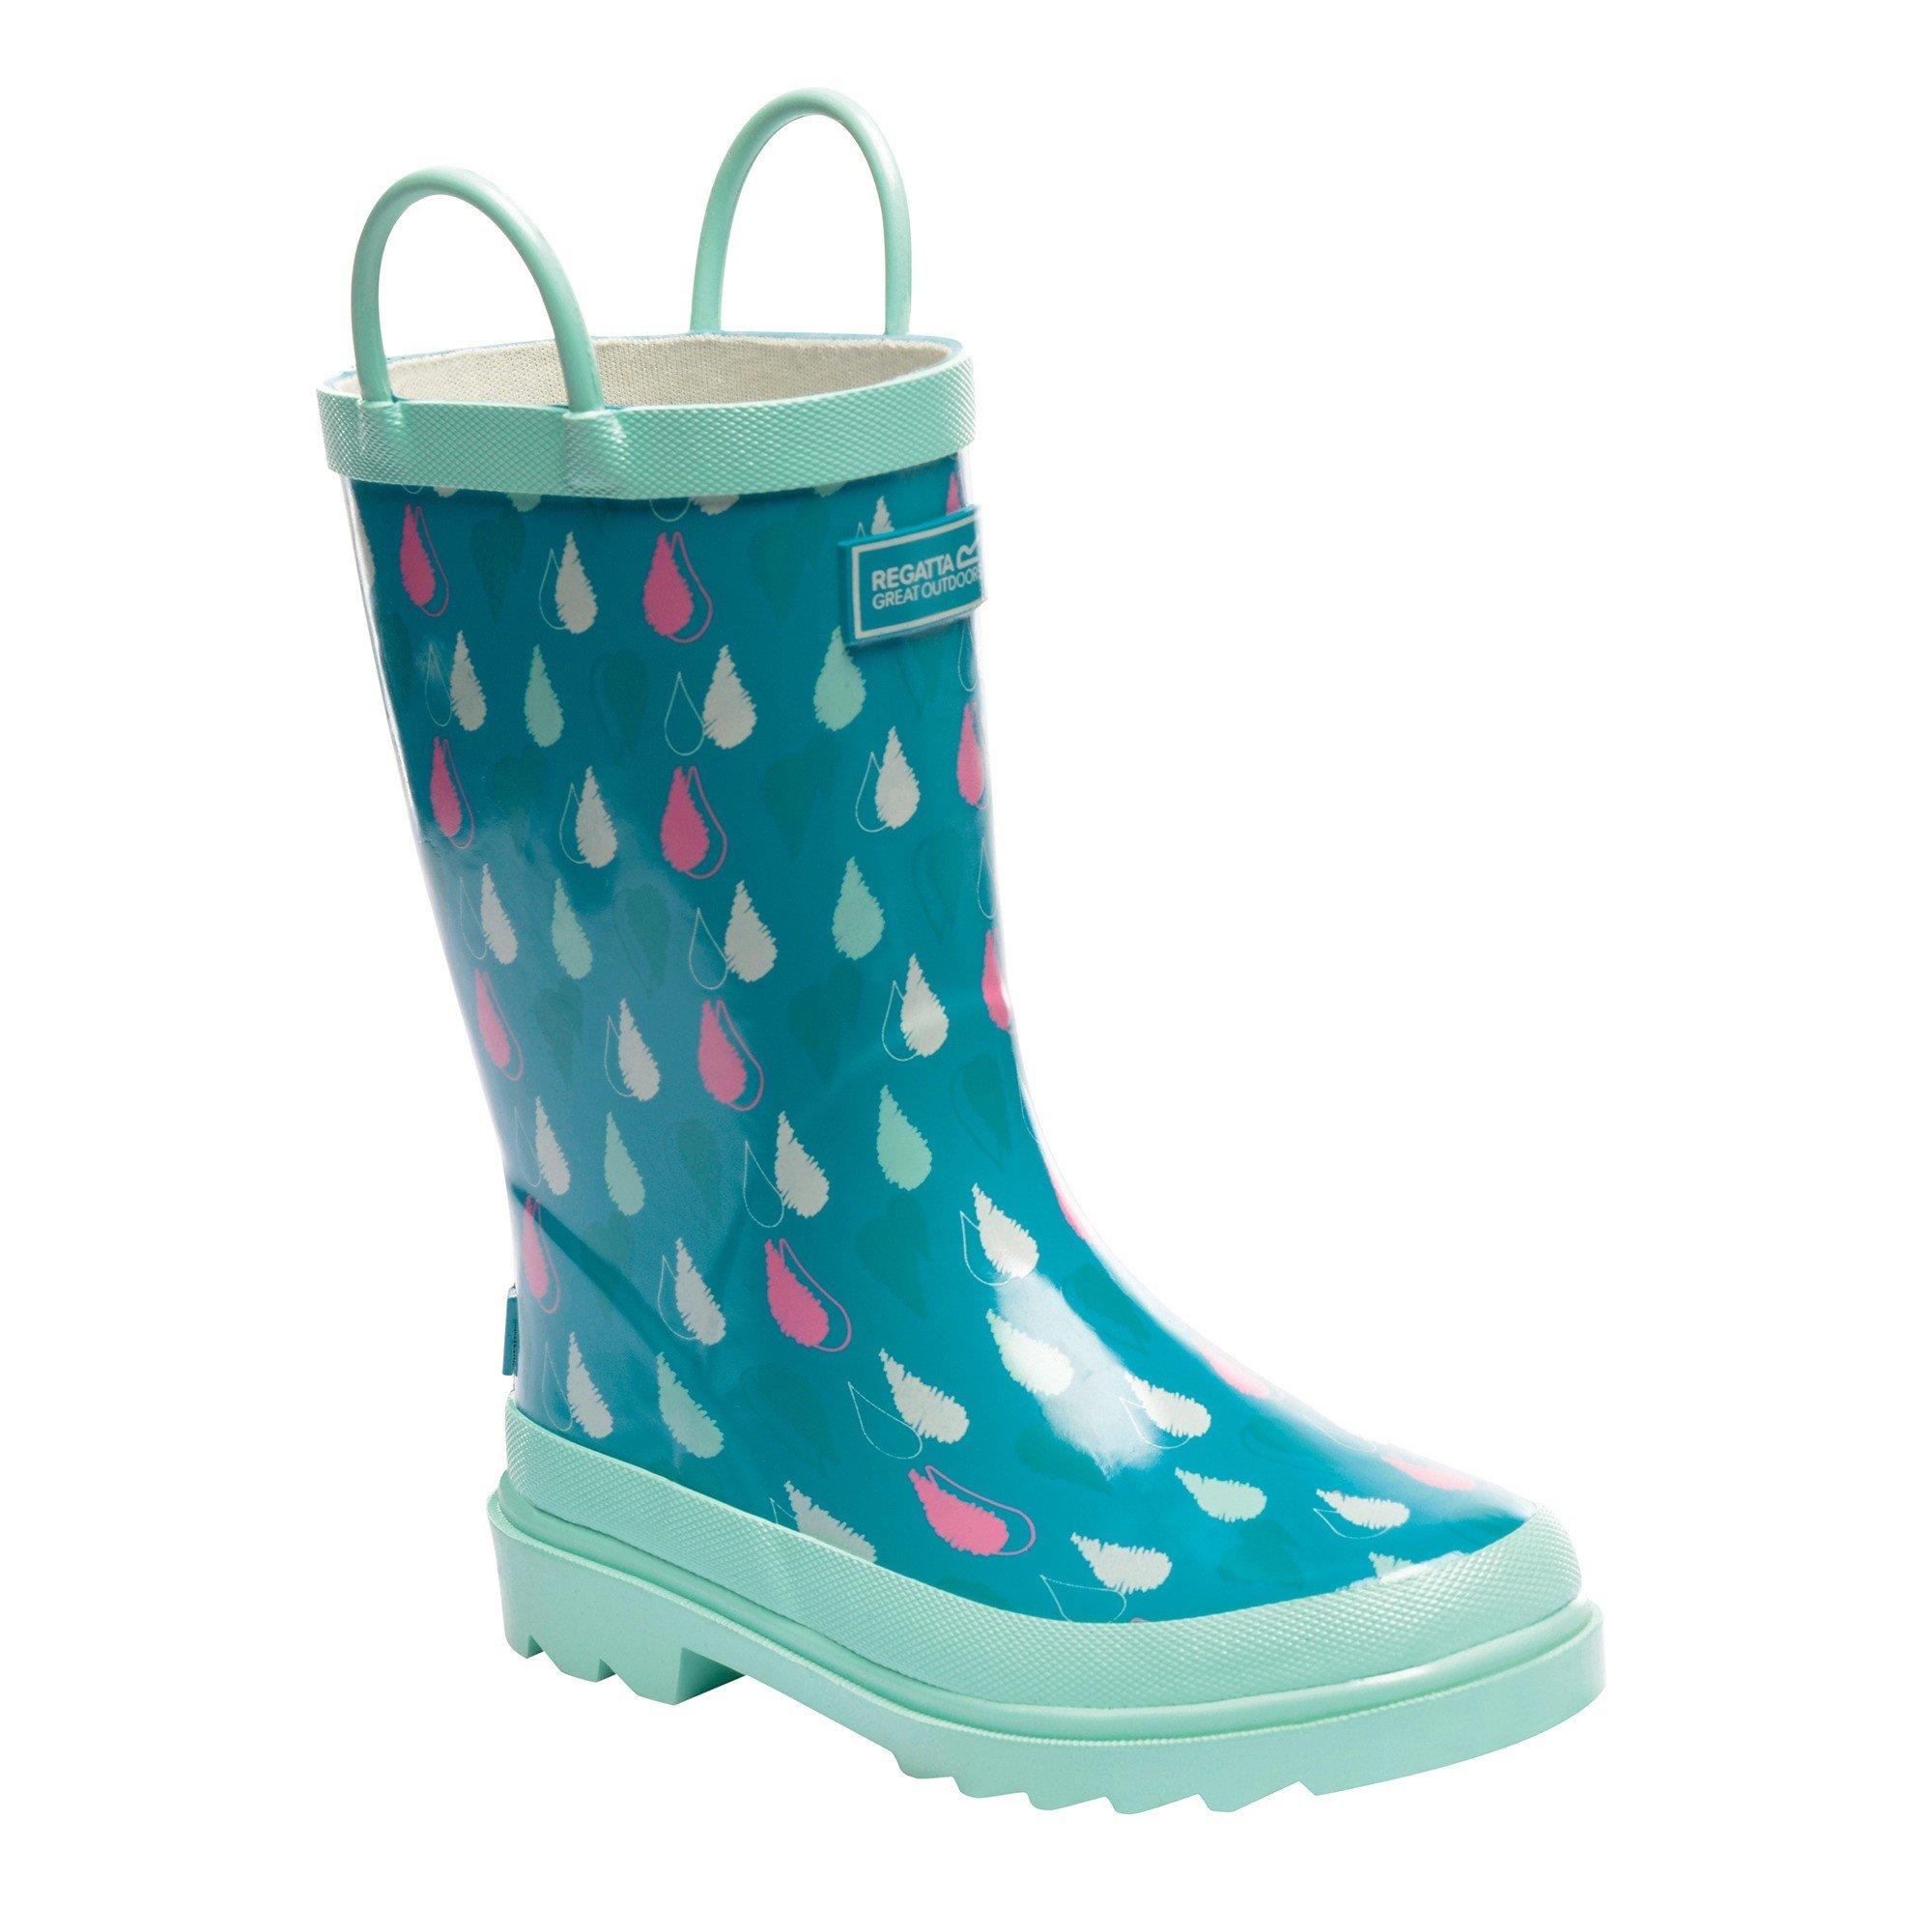 Regatta Great Outdoors Childrens/Kids Minnow Patterned Wellington Boots (US Youth 3.5) (Aqua/Mint Green)